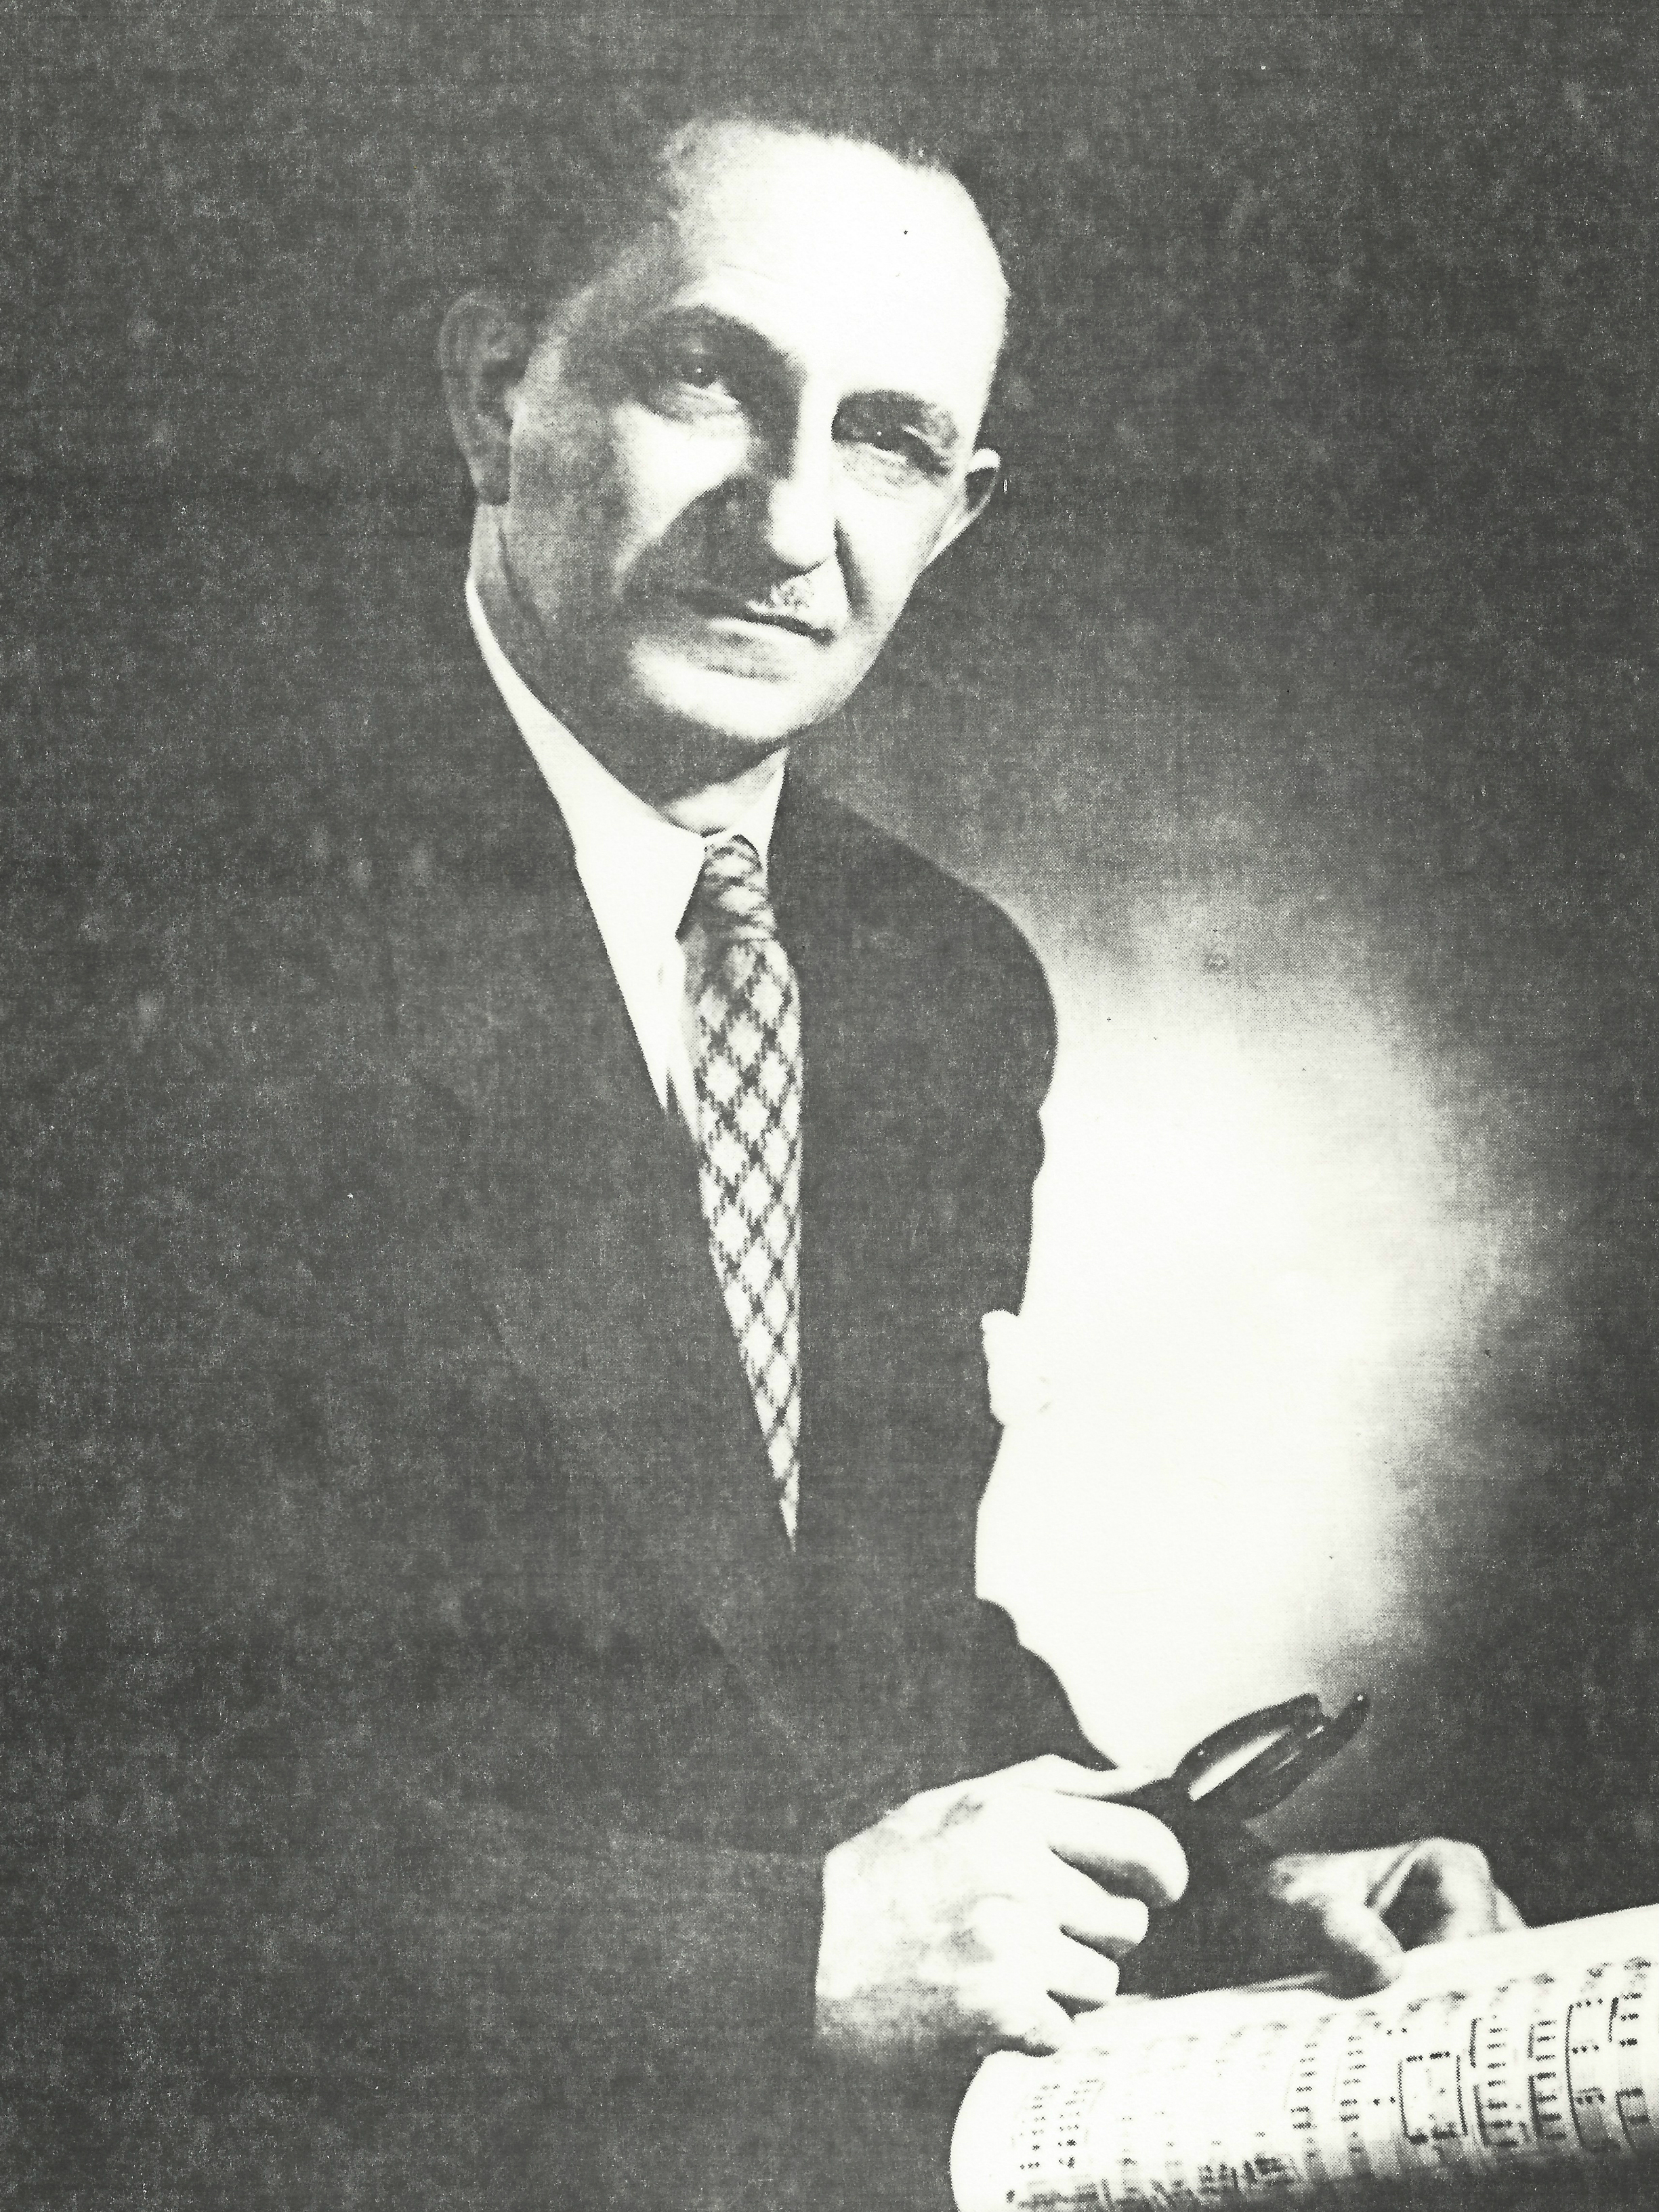 headshot of Jan Wolanek